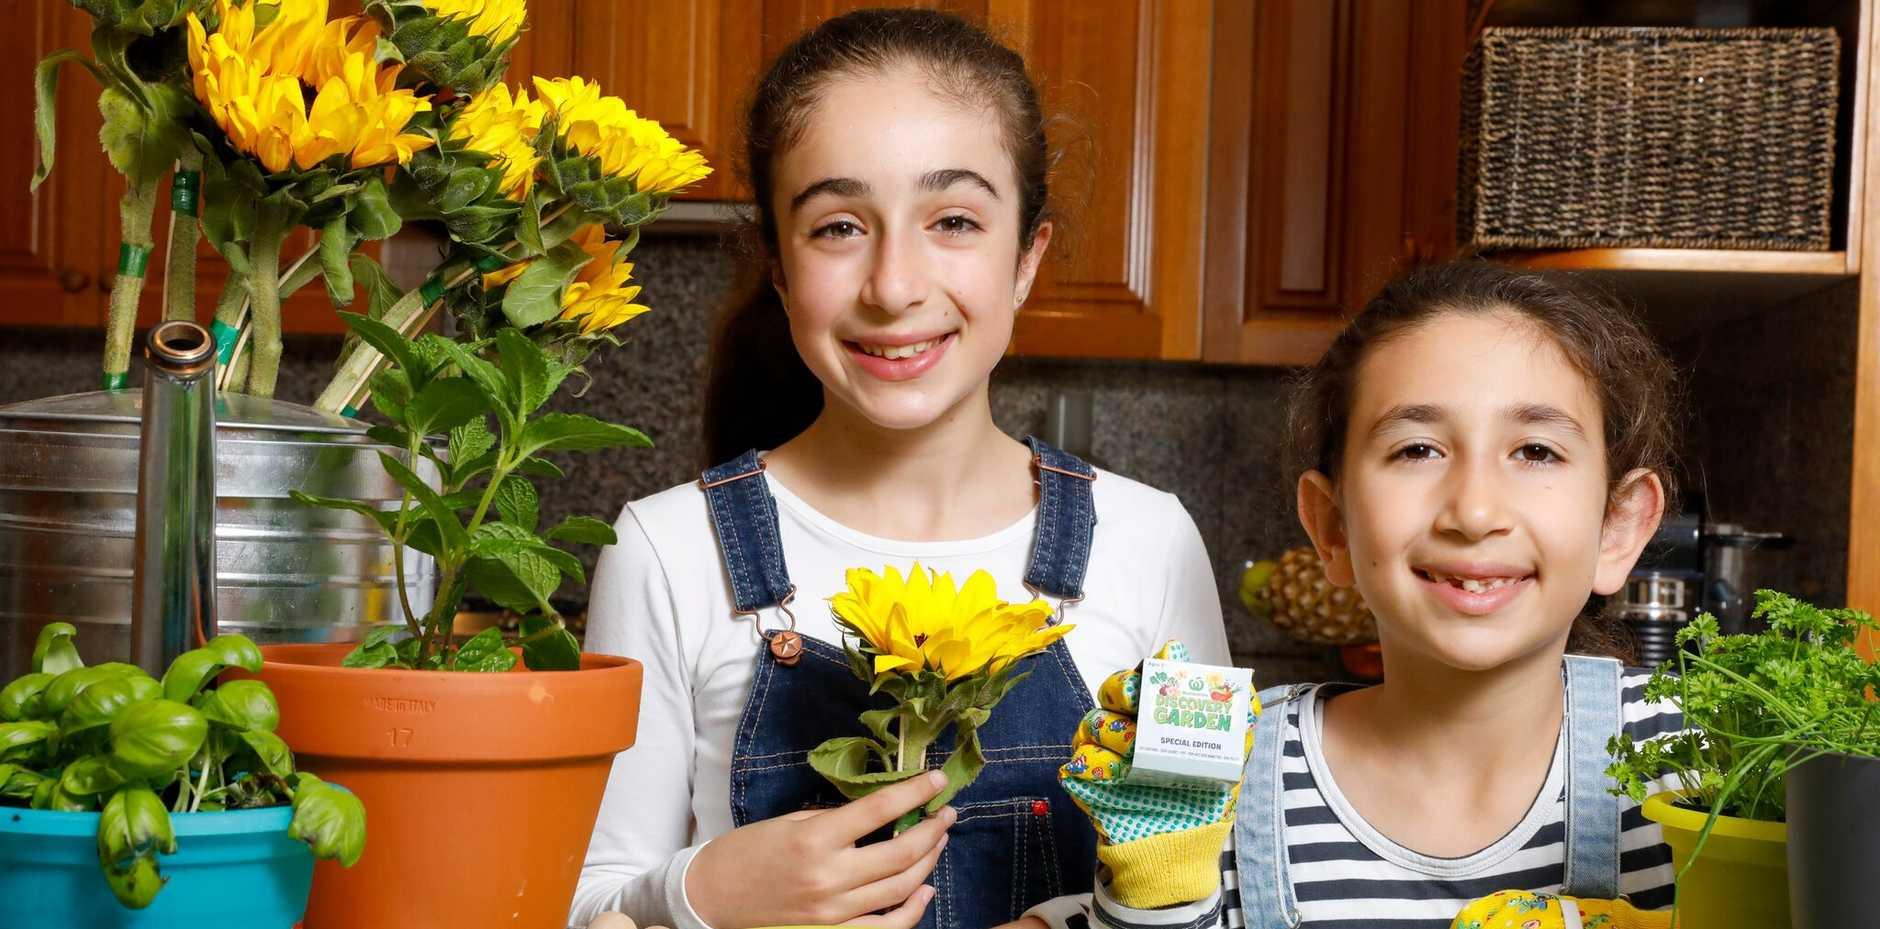 HELPING HAND: Ariel Qasabian, 10, and Abbey Qasabian, 8, with Woolworths' limited edition sunflower kits.